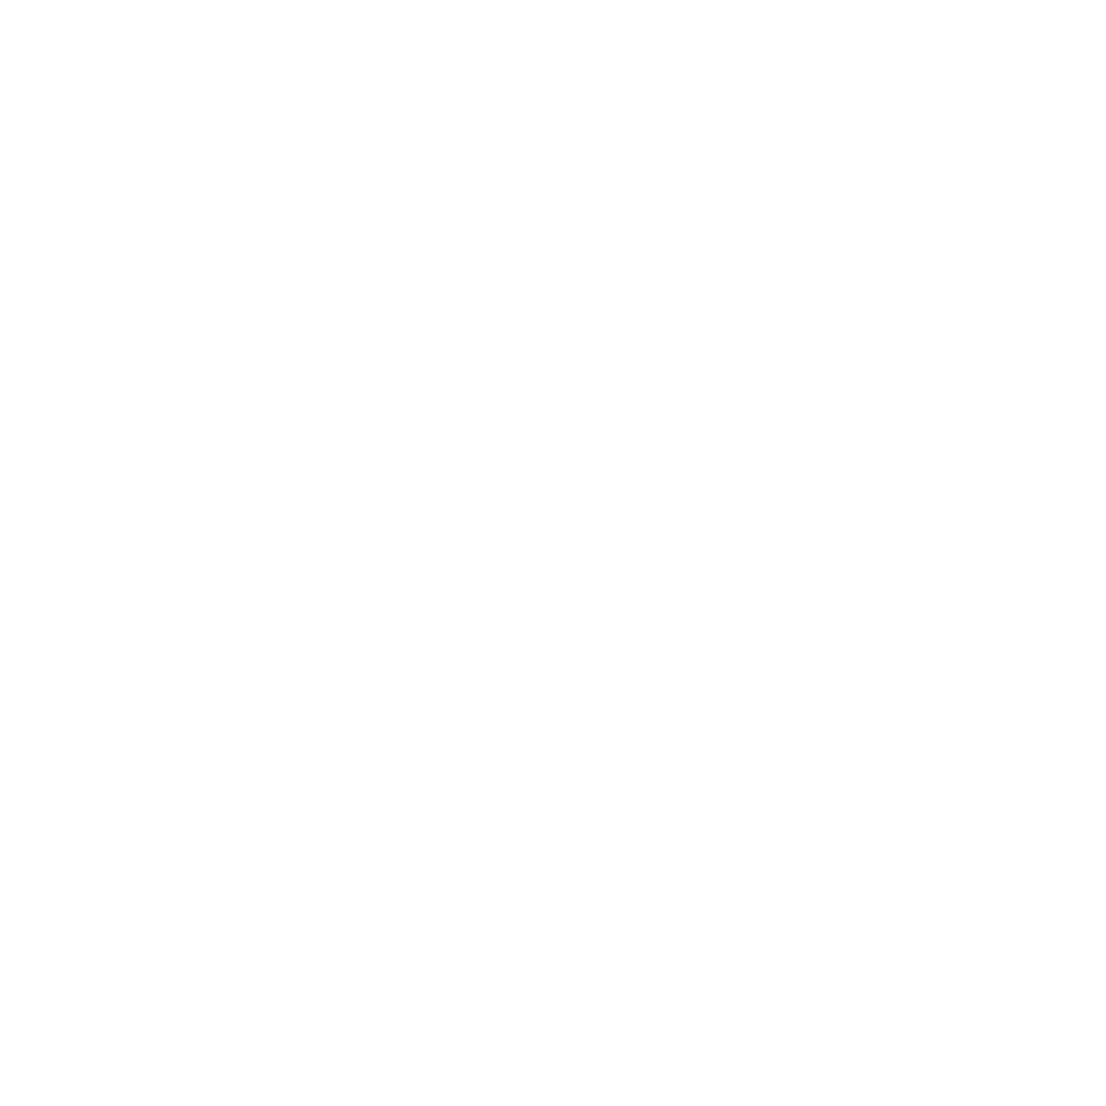 SCYHAF_Mandalla-White.png